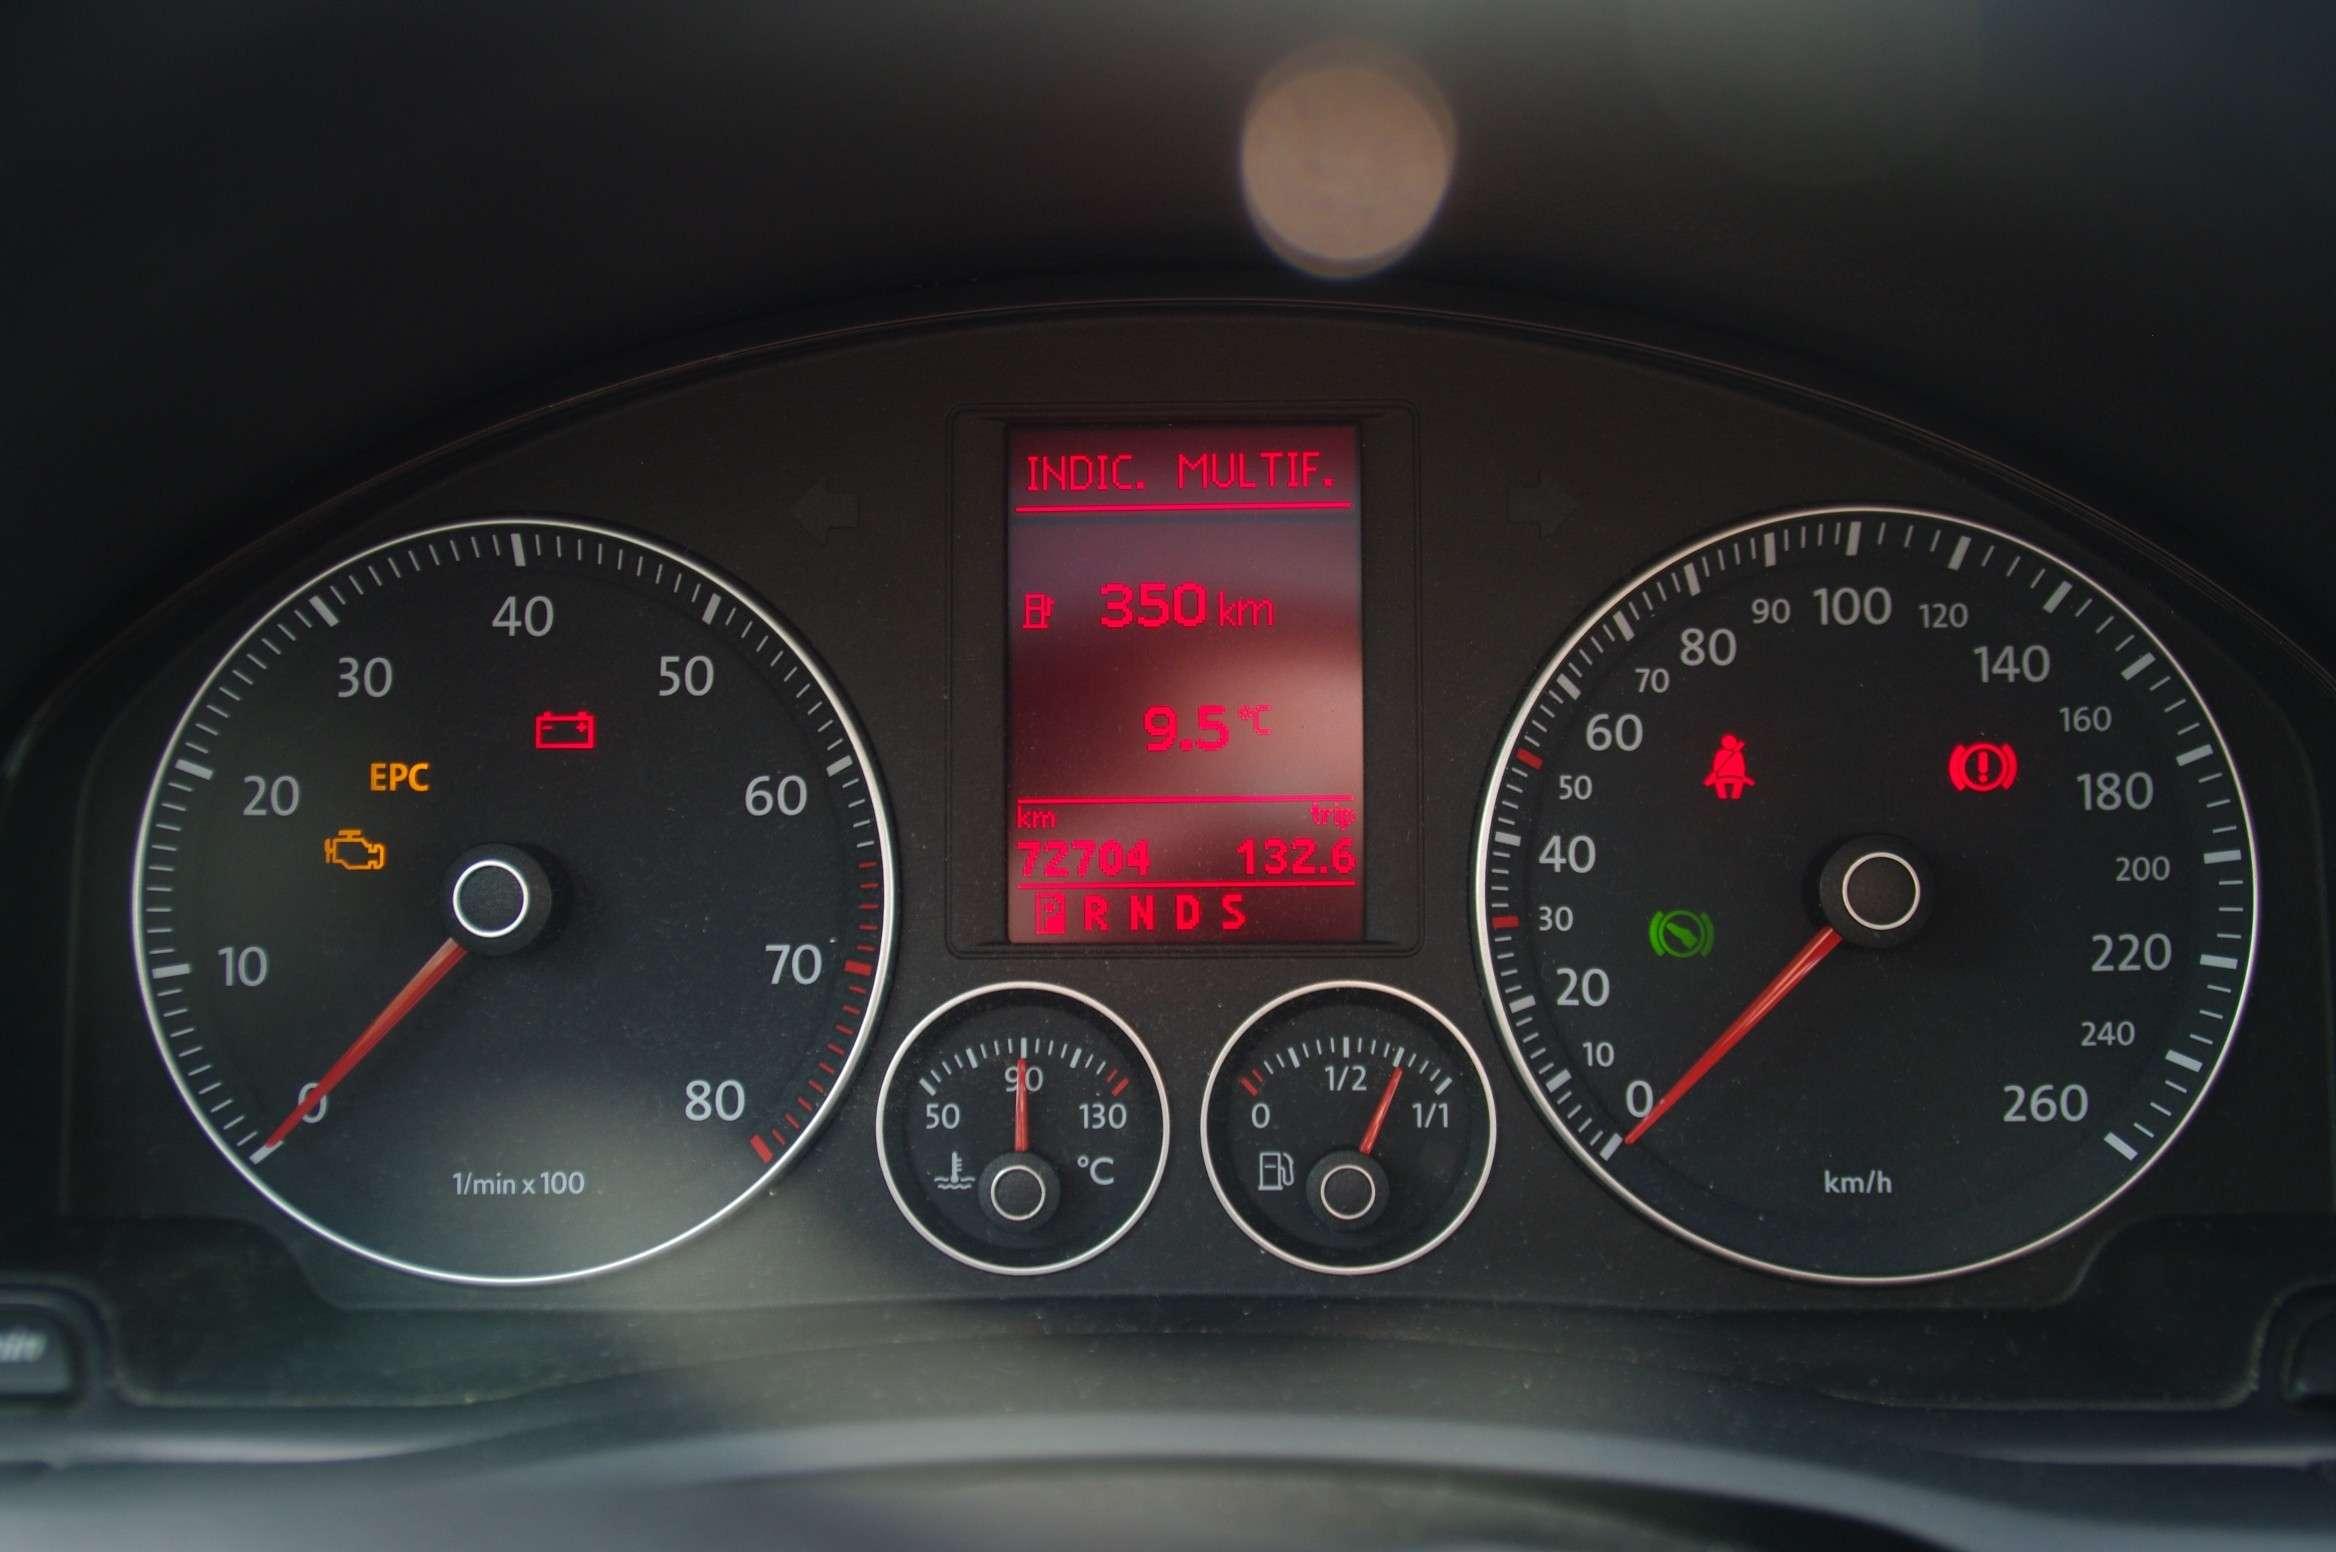 [FURB59] Renaut Clio 5 - Intens TCE 100 Imgp6517